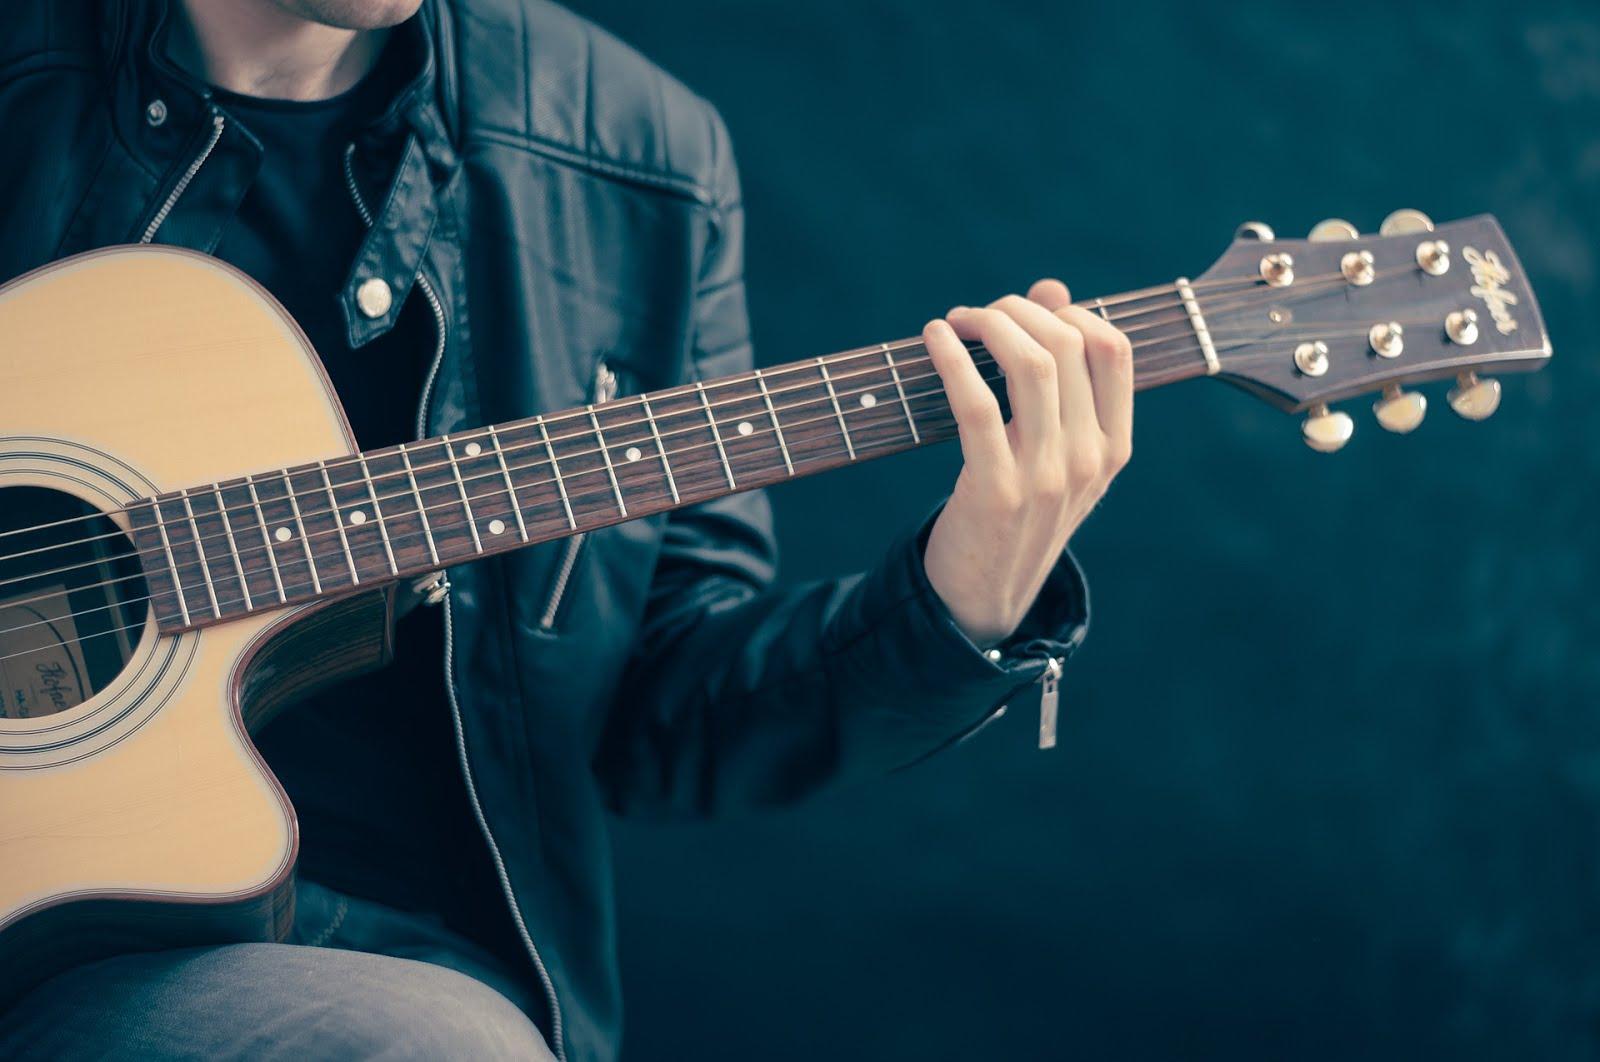 progresi chord, chord, kunci gitar, kunci, gitar, lagu, www.slashkygitaris.com, slashky gitaris